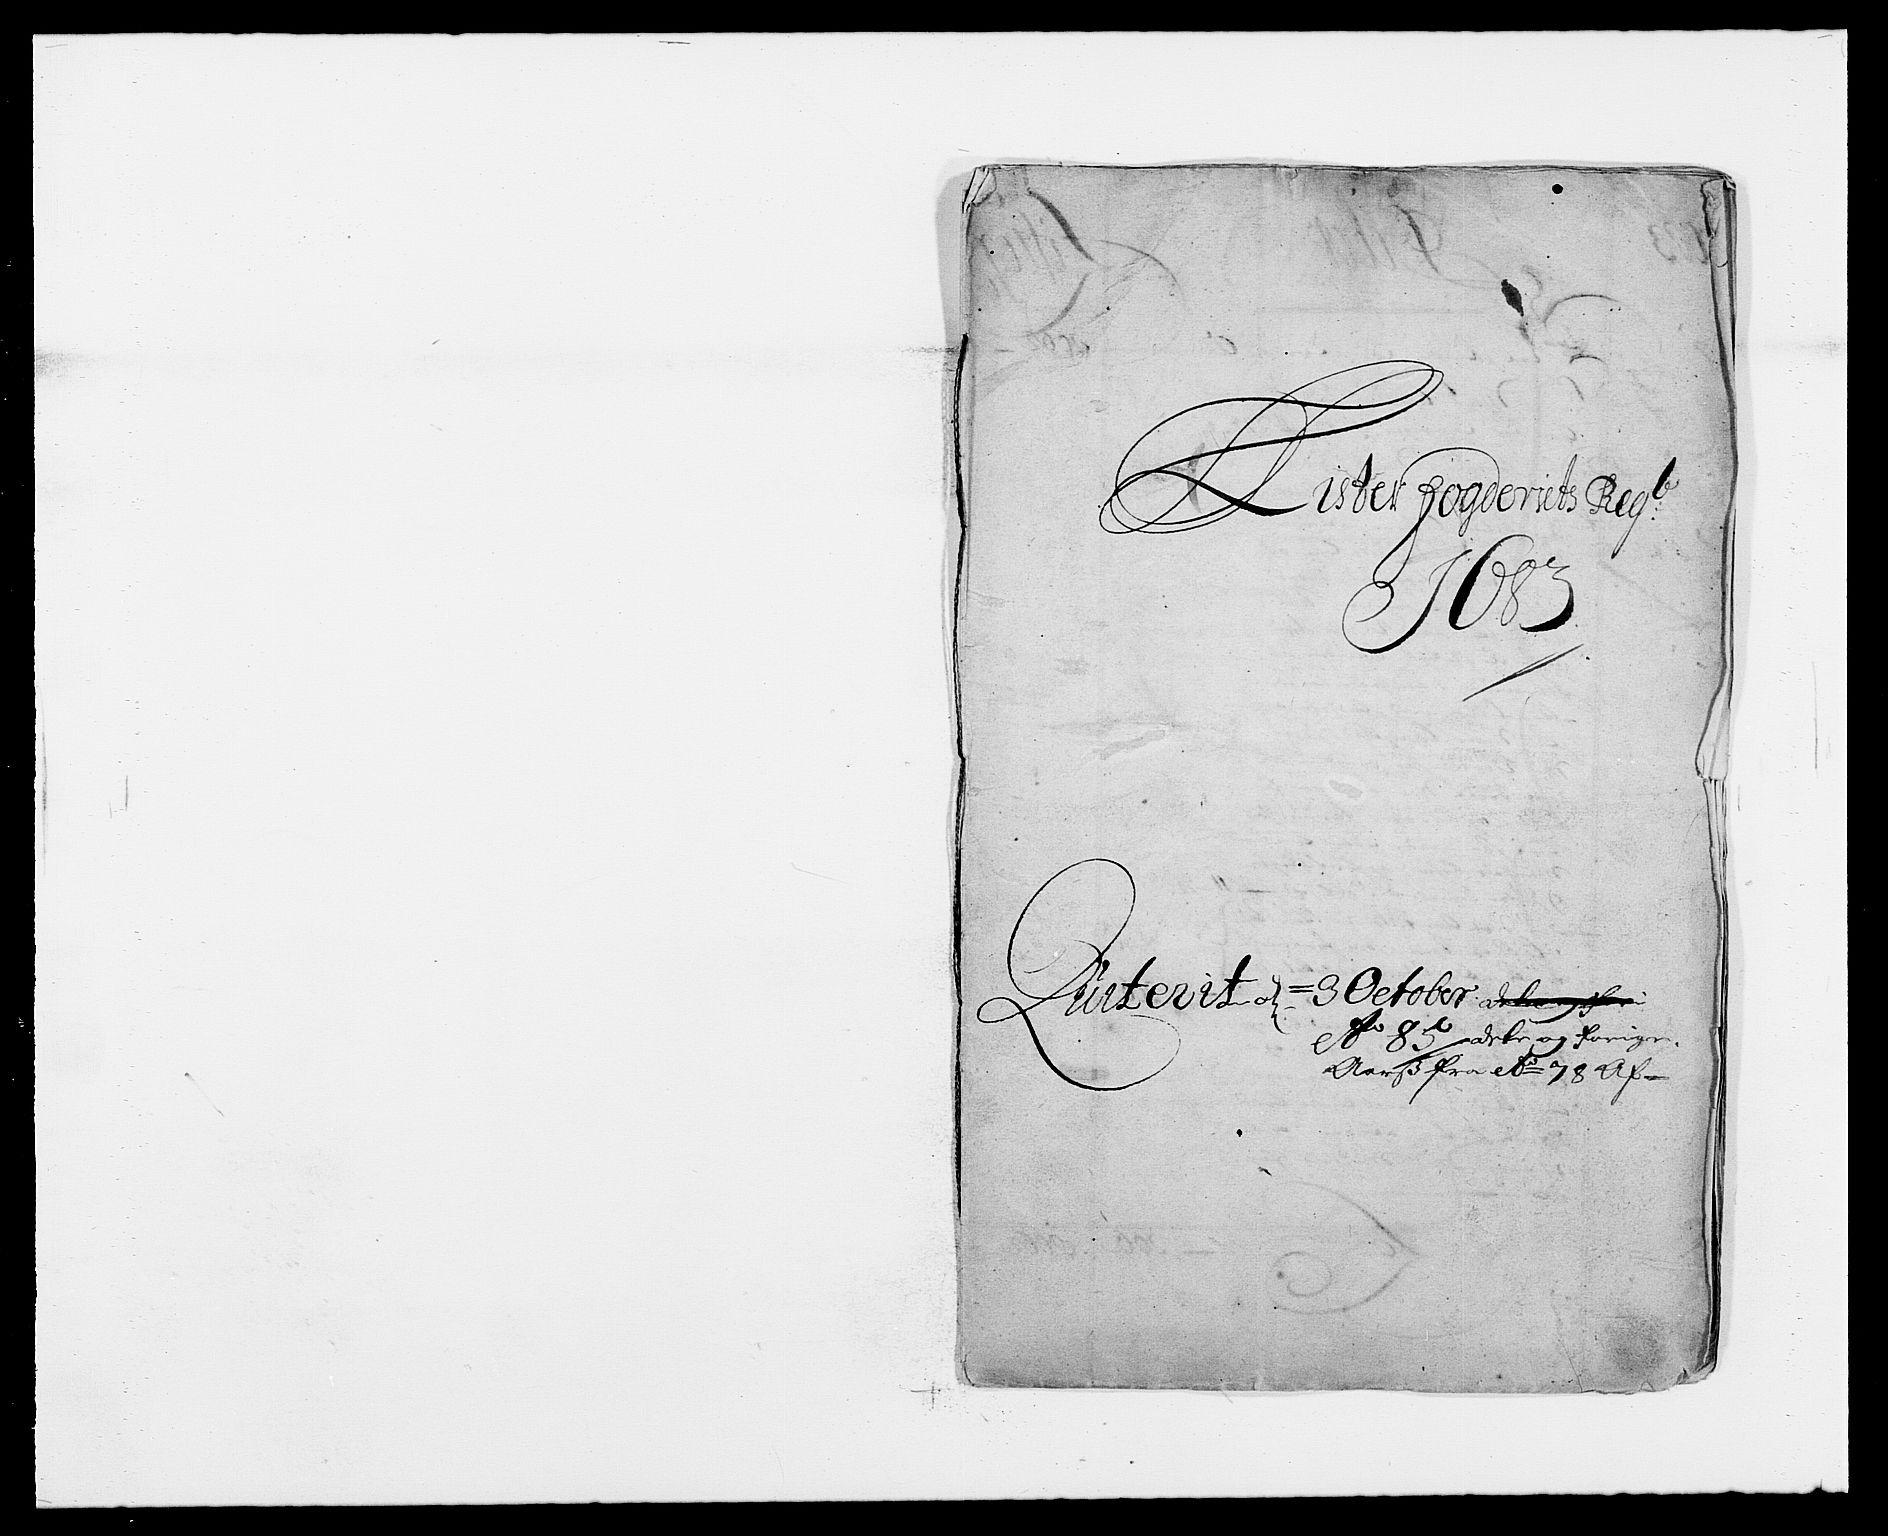 RA, Rentekammeret inntil 1814, Reviderte regnskaper, Fogderegnskap, R41/L2532: Fogderegnskap Lista, 1683, s. 1